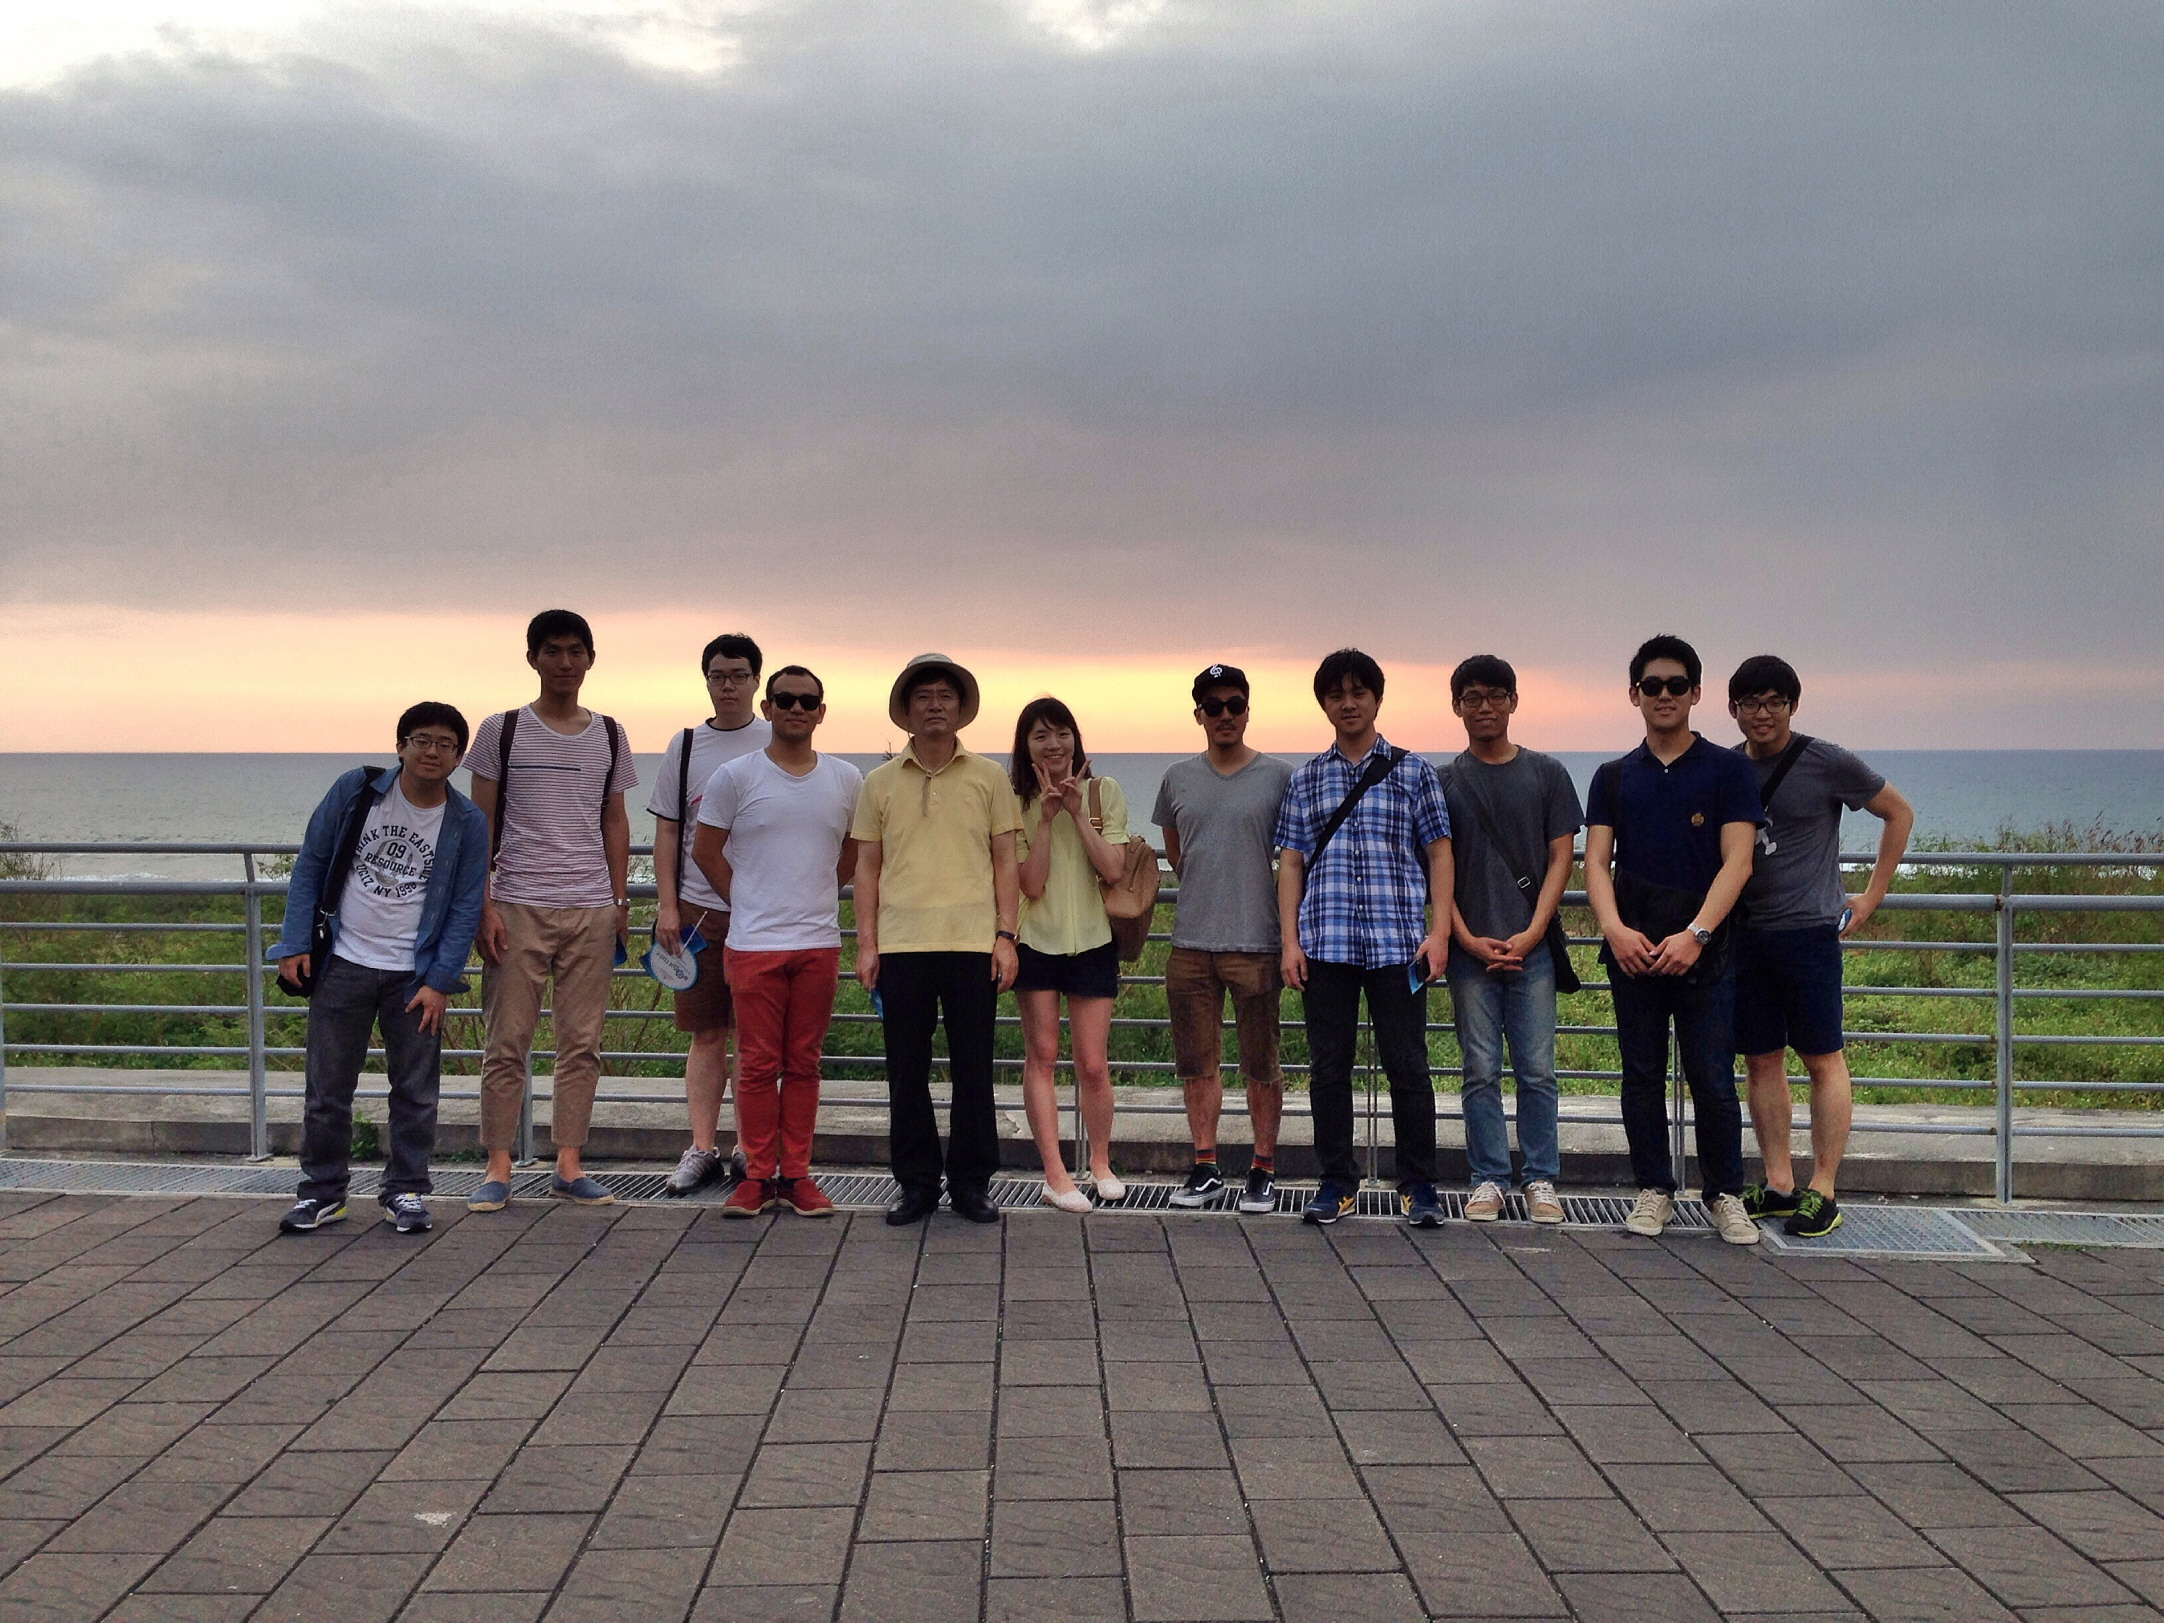 2013 10 12 Supergreen_IMG_2185.JPG